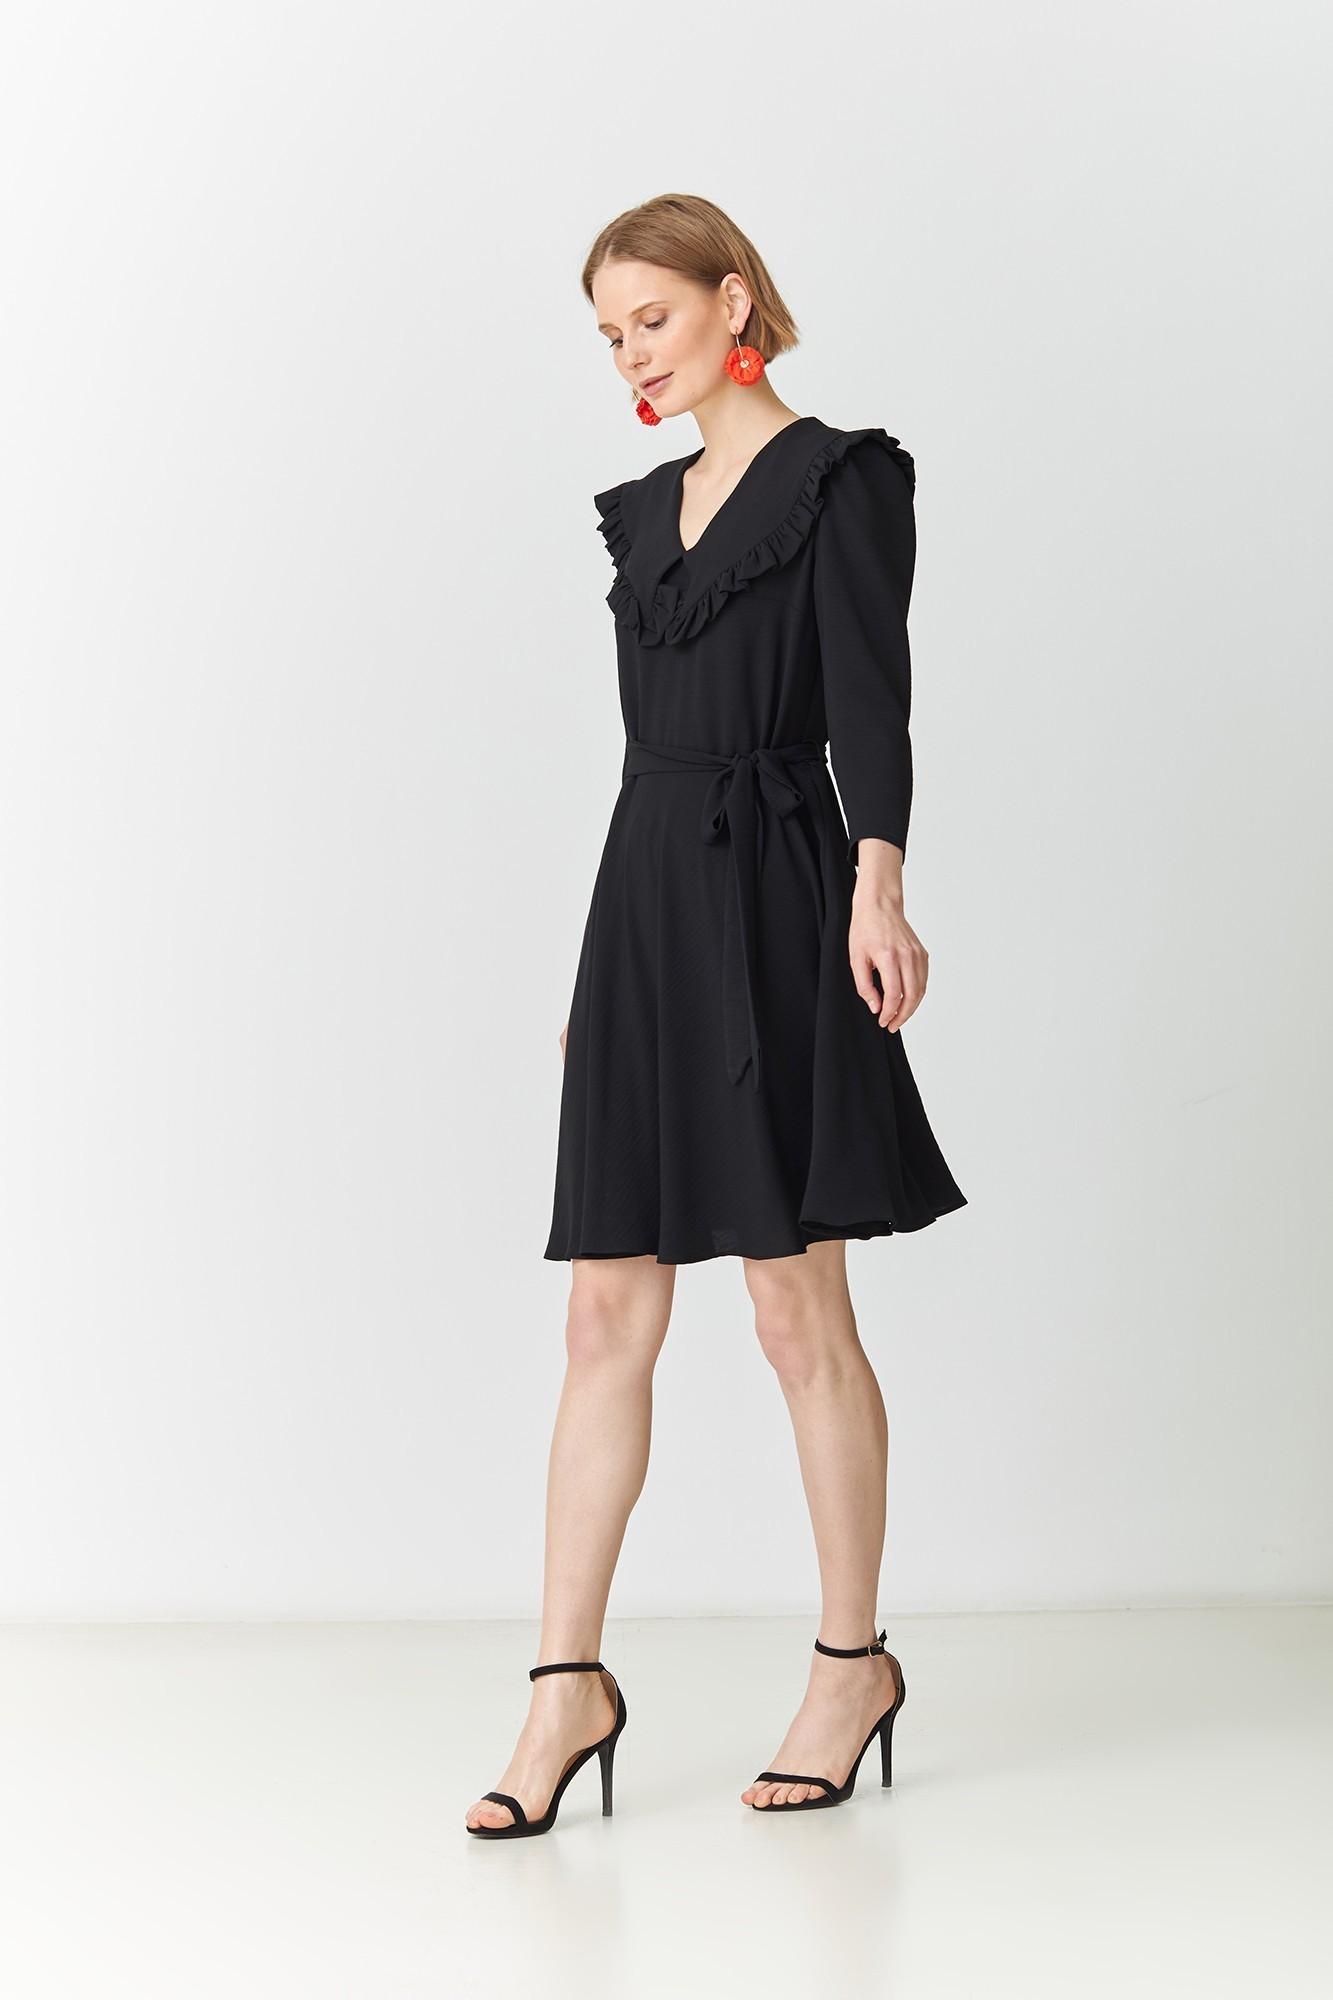 SISTER BERNARD DRESS